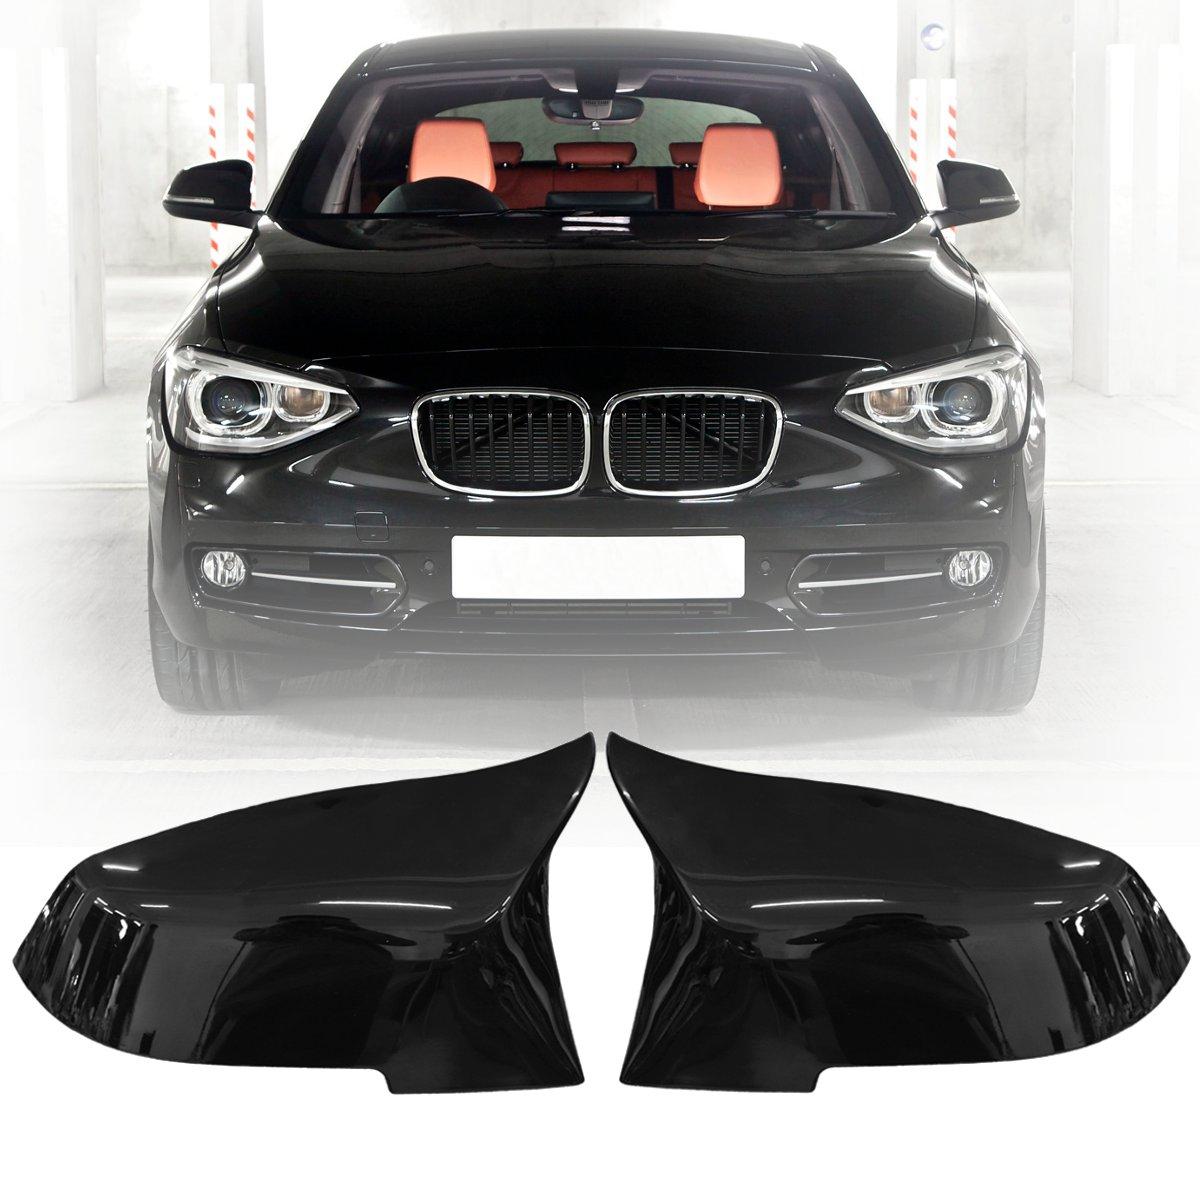 1 пара автомобиля черный глянец Зеркало заднего вида крышка Кепки для BMW F20 F21 F22 F30 F32 F36 X1 F87 M3 2012 2013 2014 2015 2016 2017